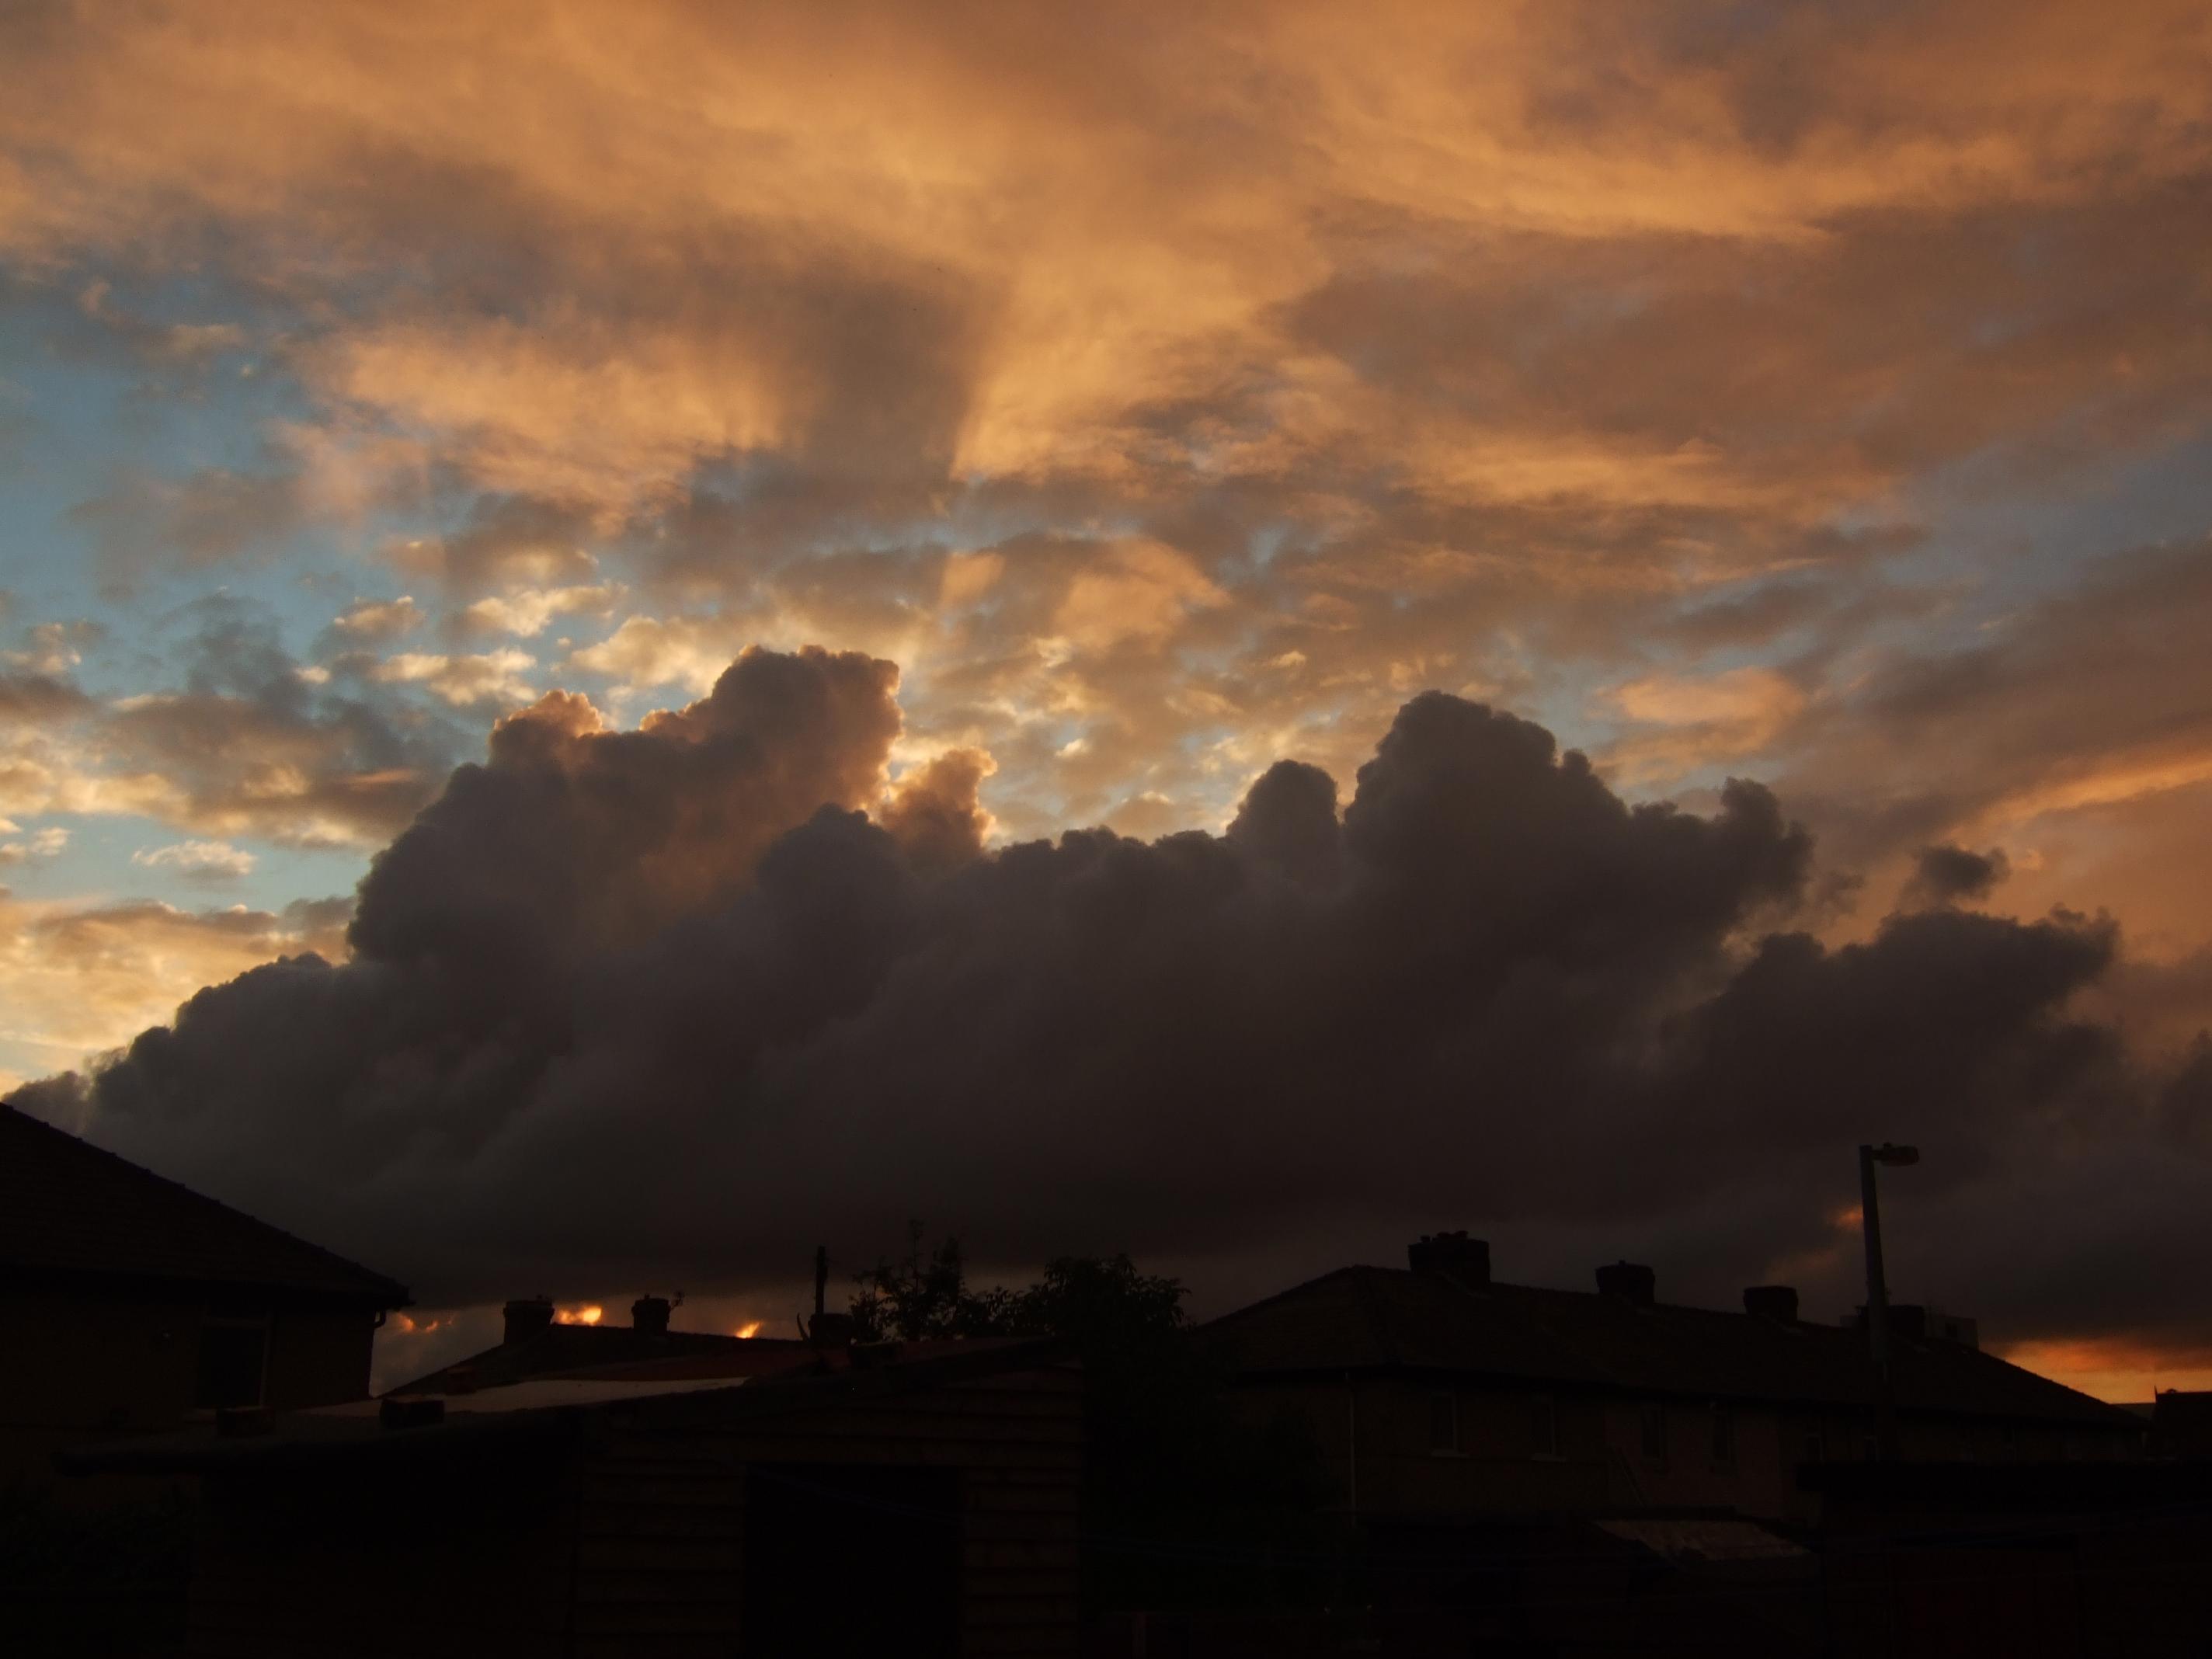 Clouds, Blue, Cloudy, Heaven, Skies, HQ Photo